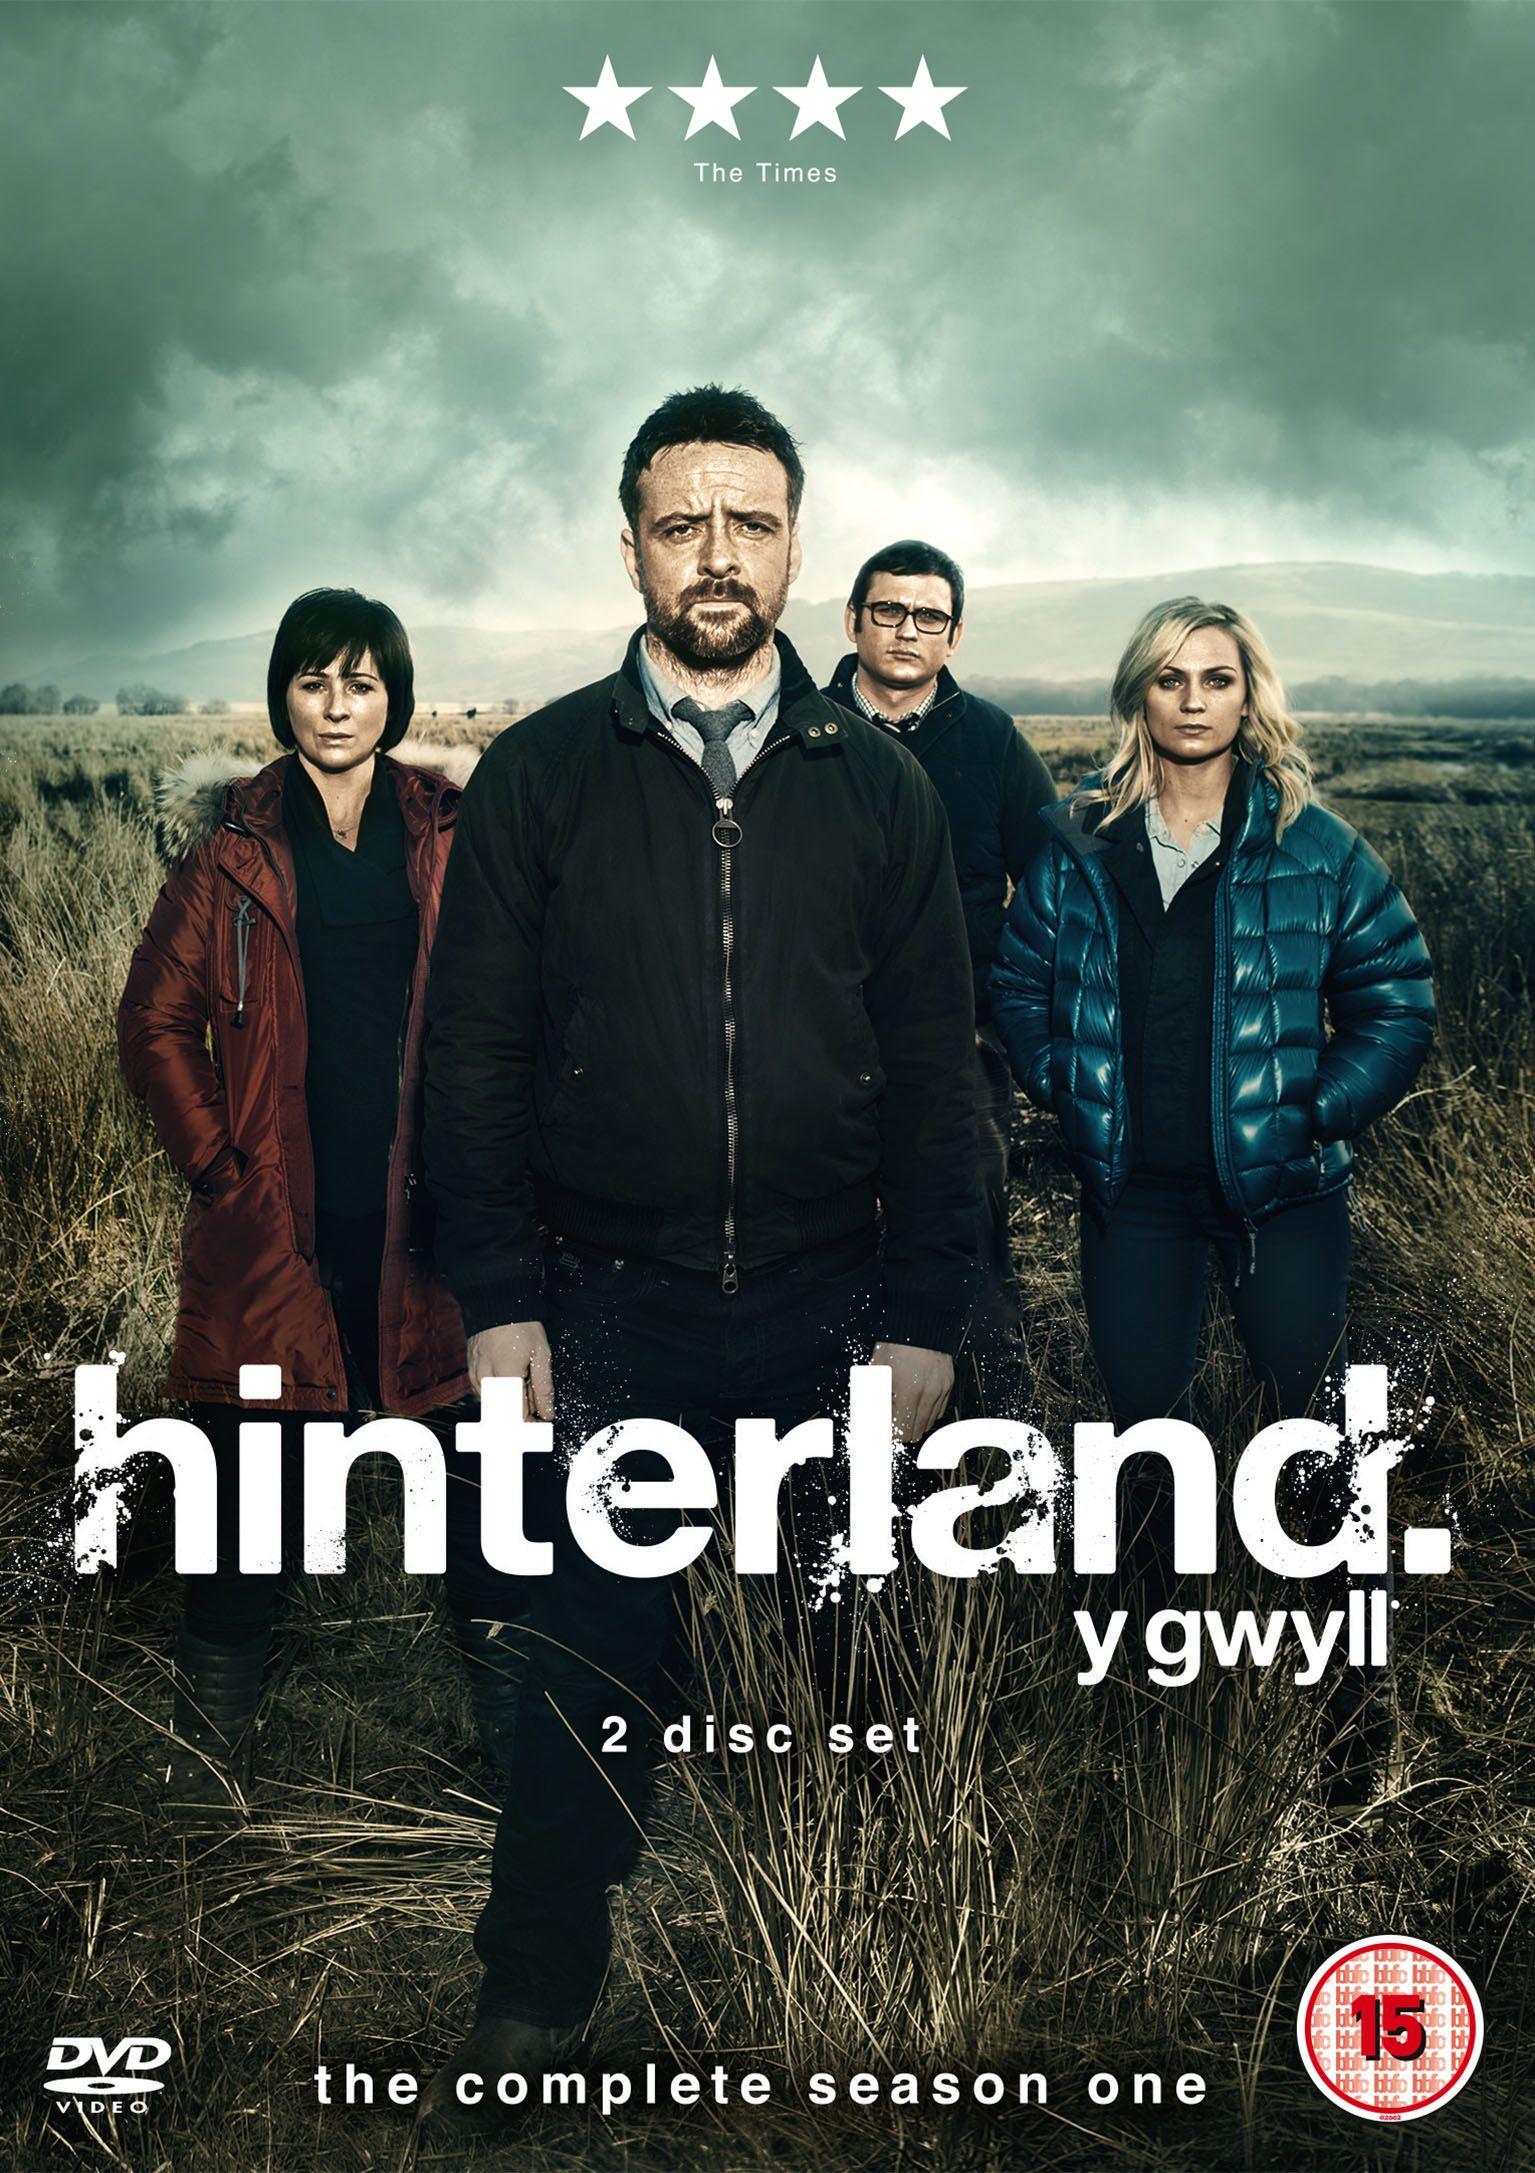 Hinterland / Y Gwyll (2013 - present) #tvseries #bbc #crime